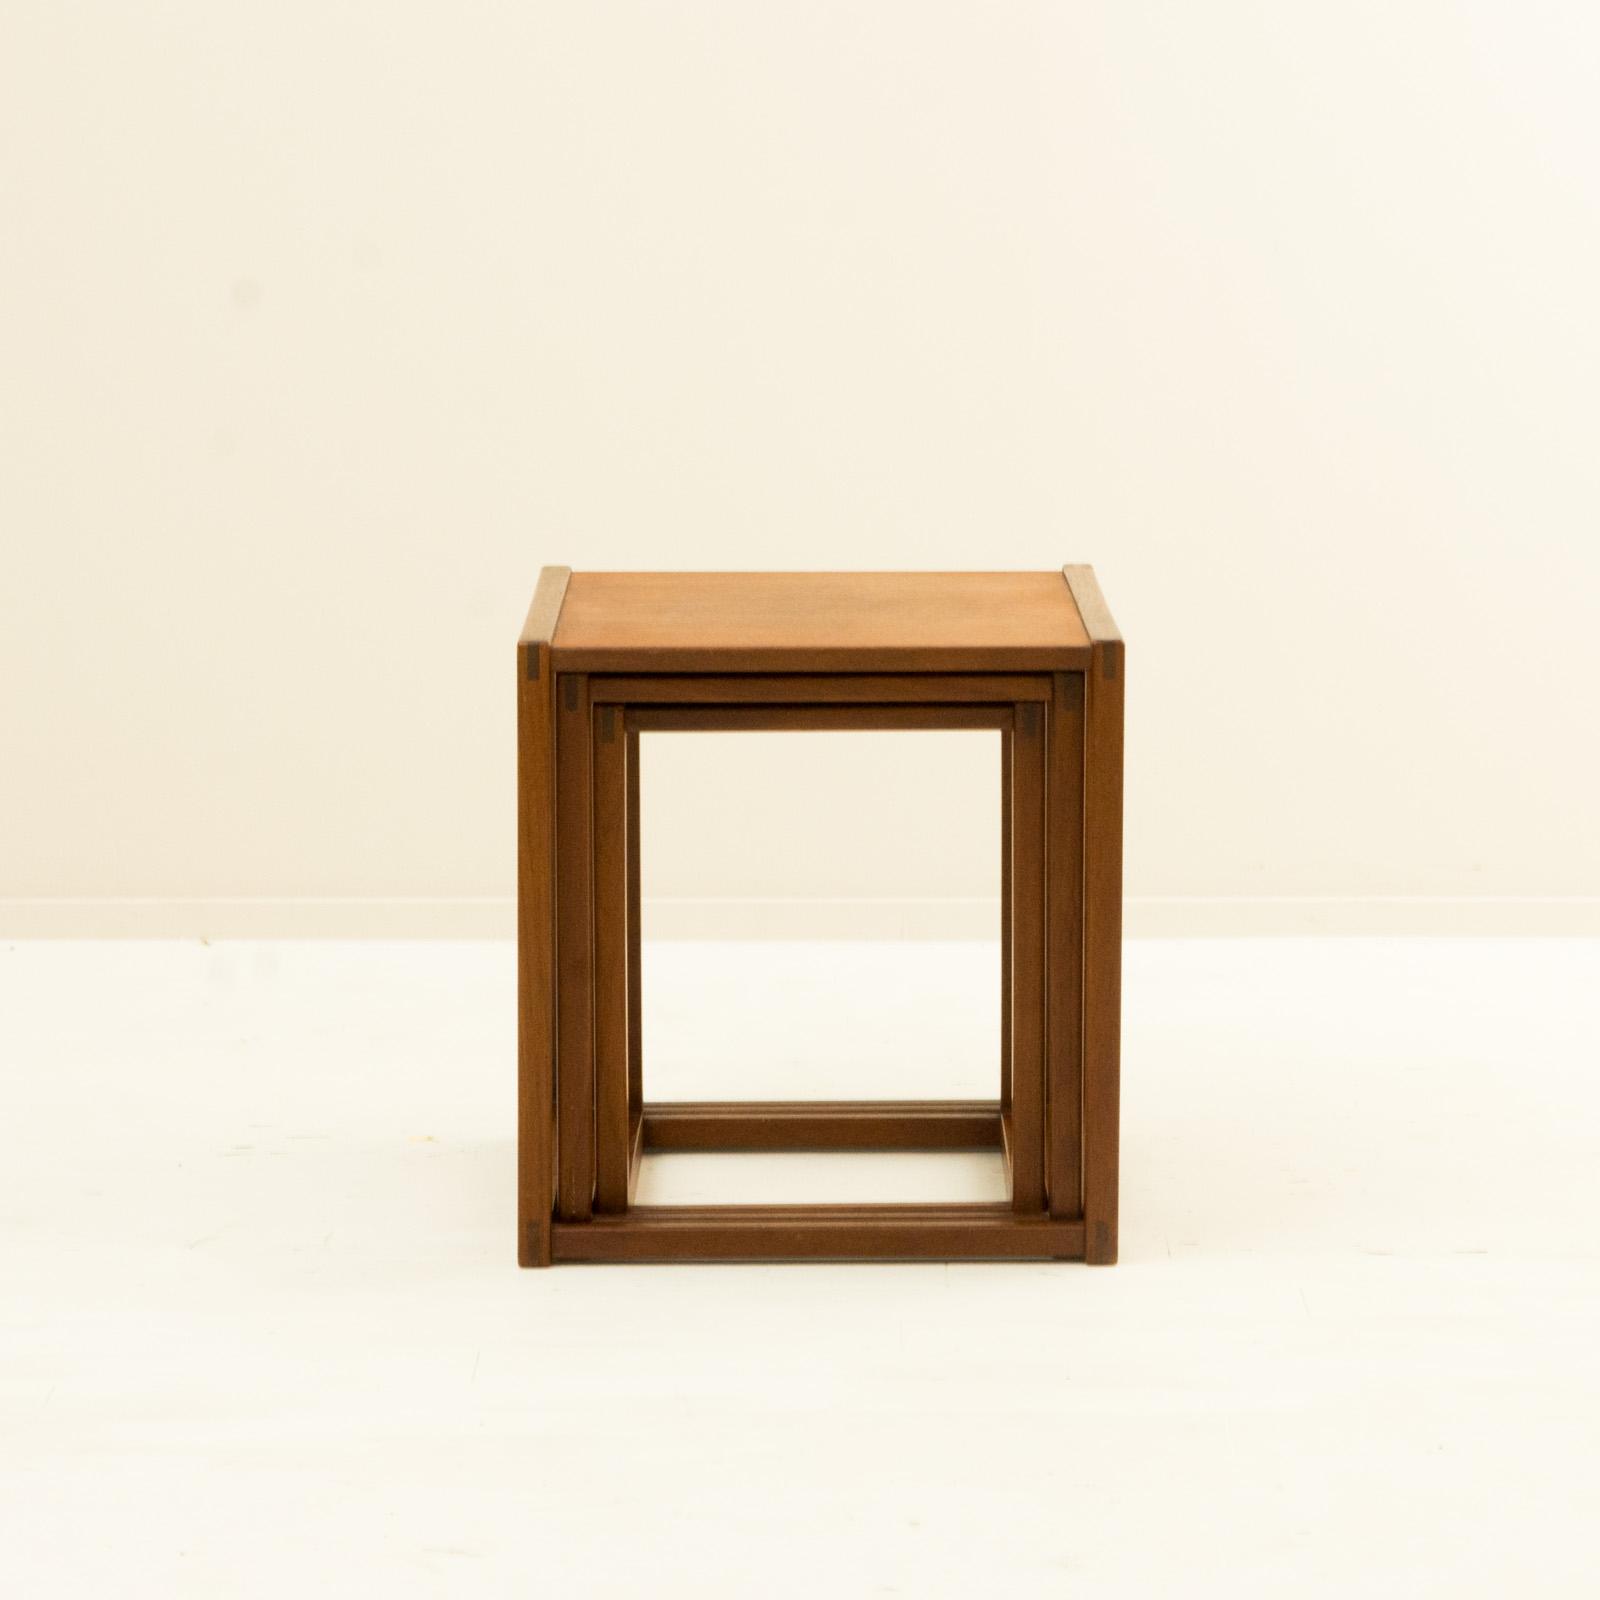 Nest Table by Borge Mogensen